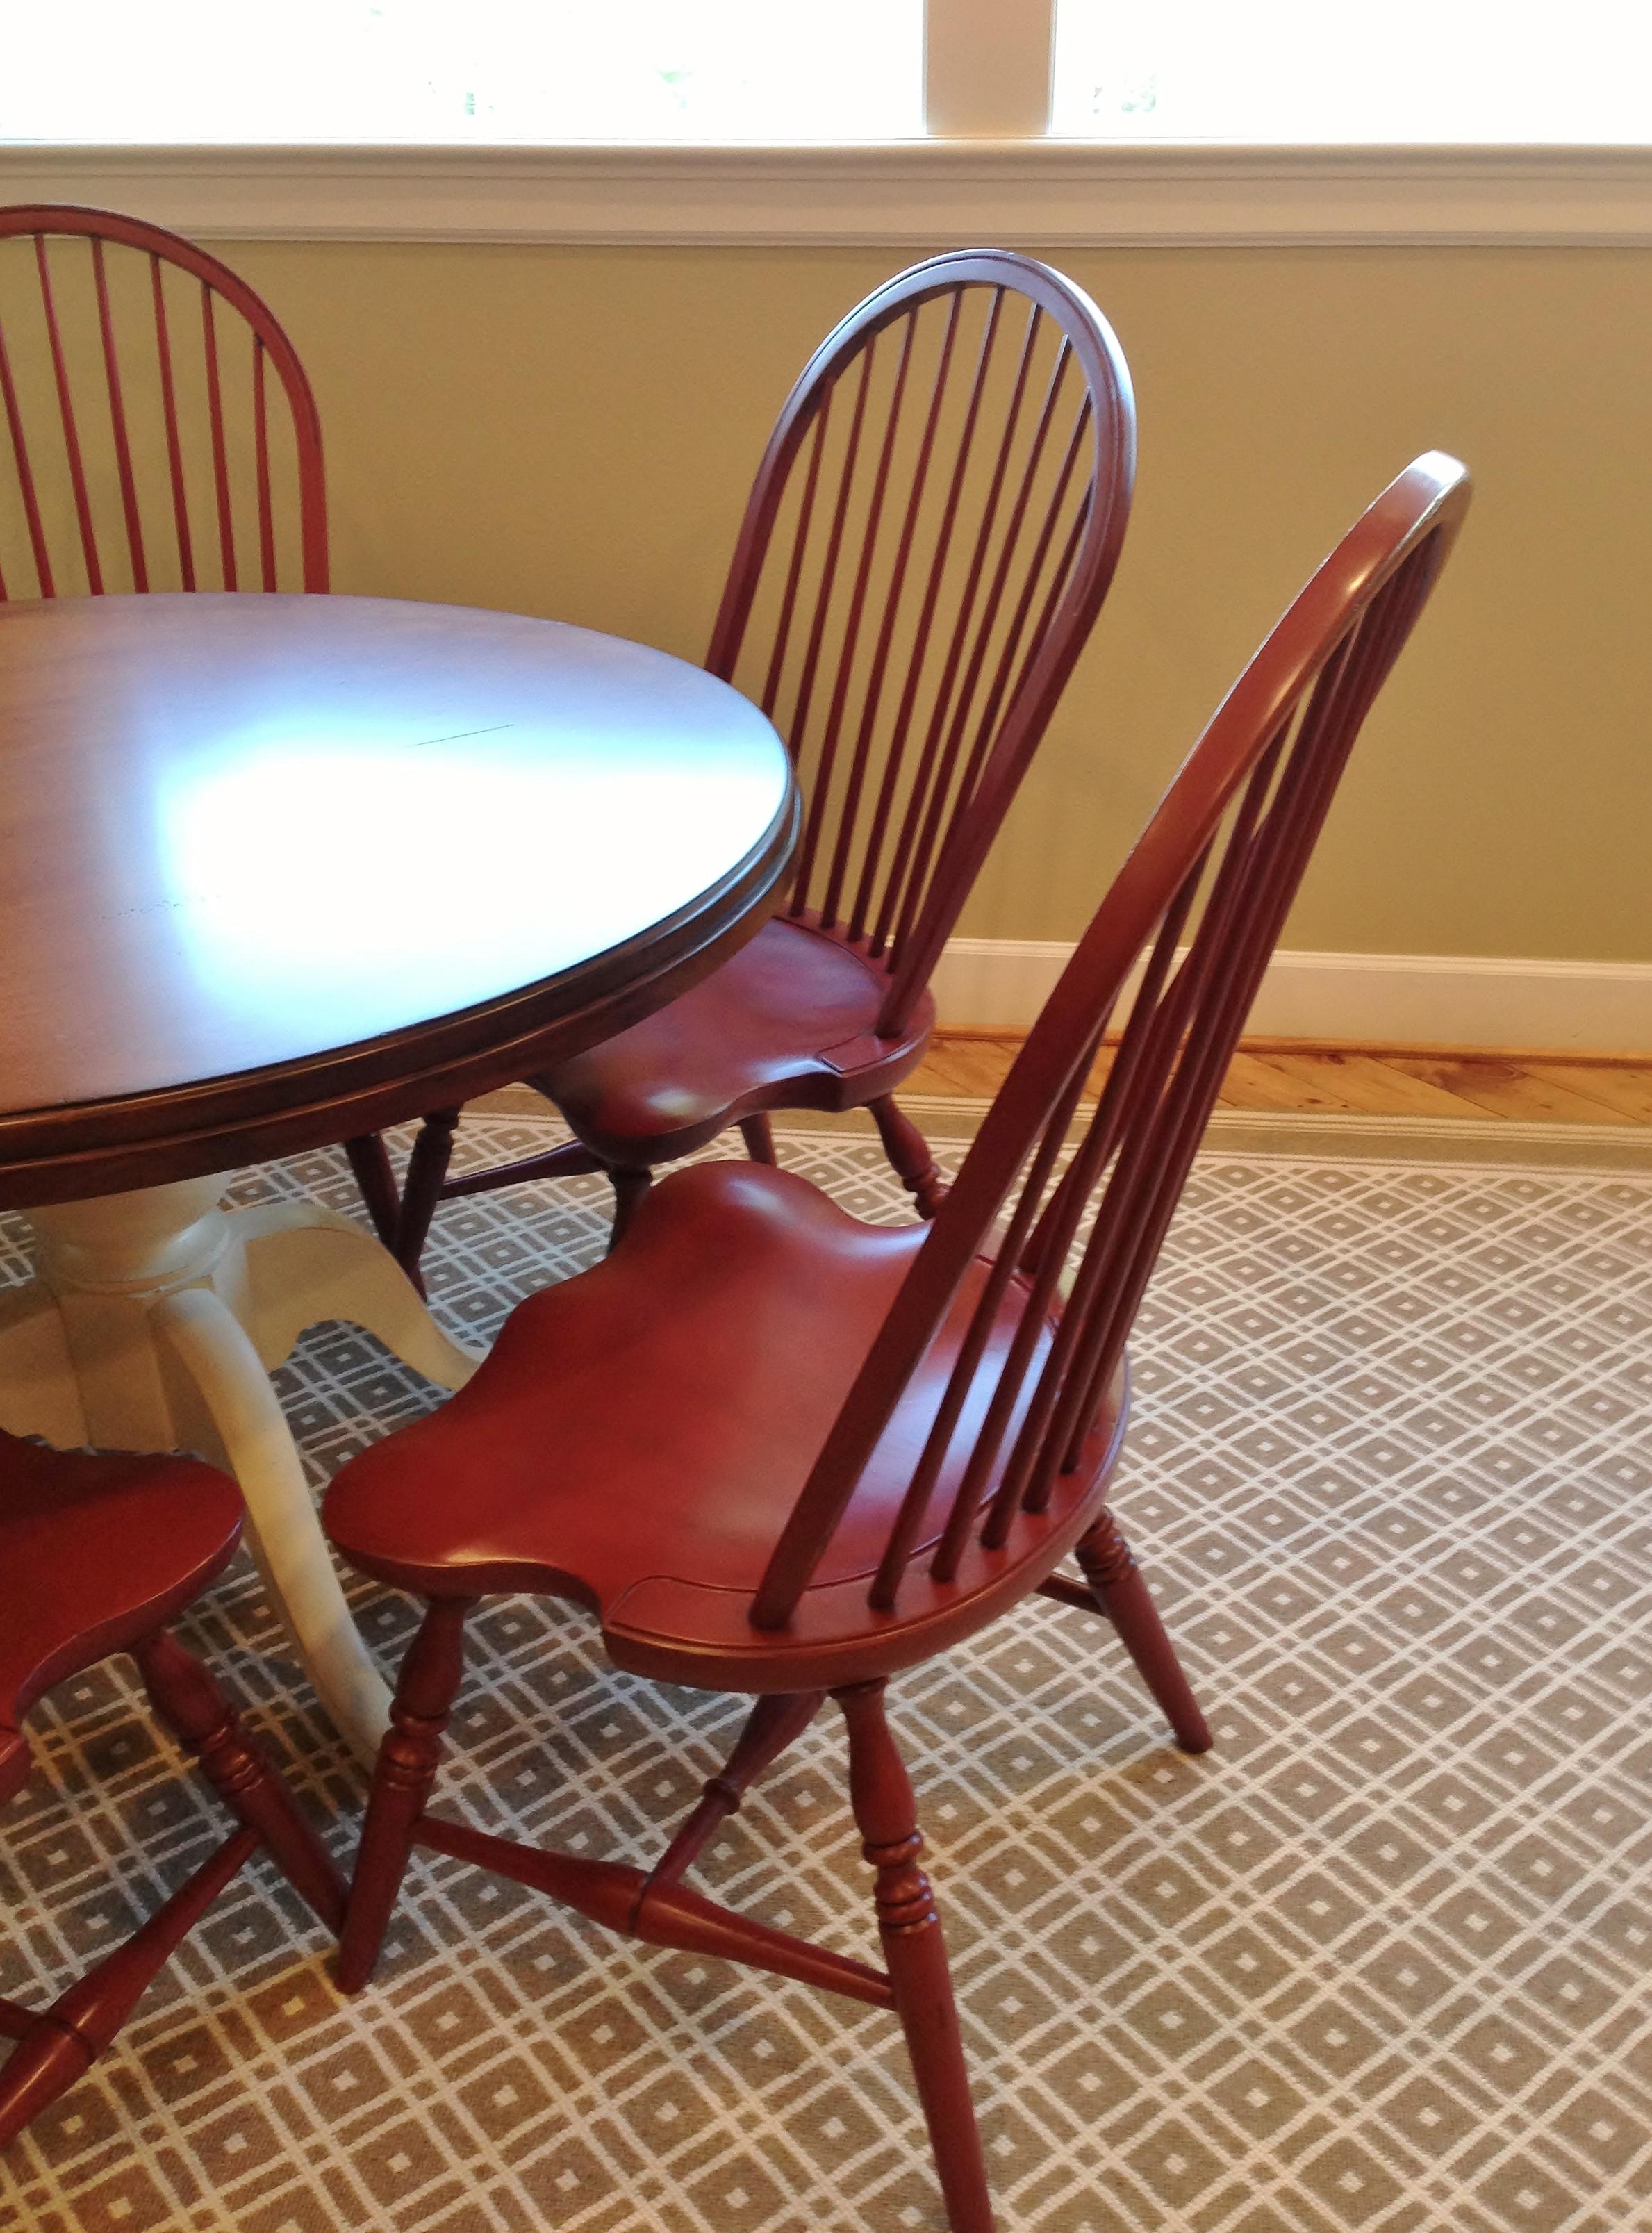 Red Windsor chair in Americana style gameroom - Designer: Carla Aston #windsorchair